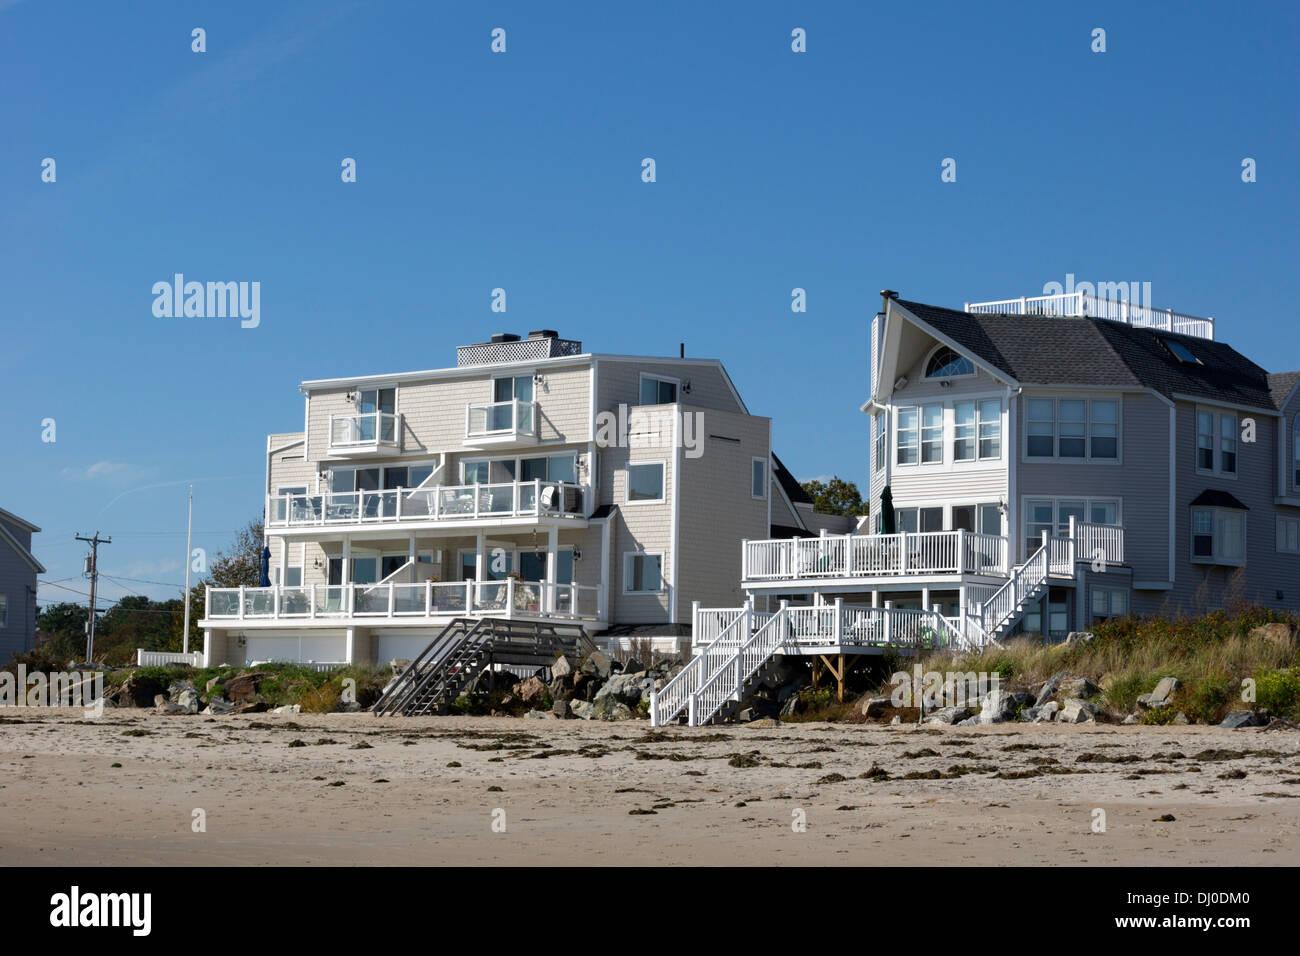 Beach houses at Hampton Beach, New Hampshire, USA Stock Photo